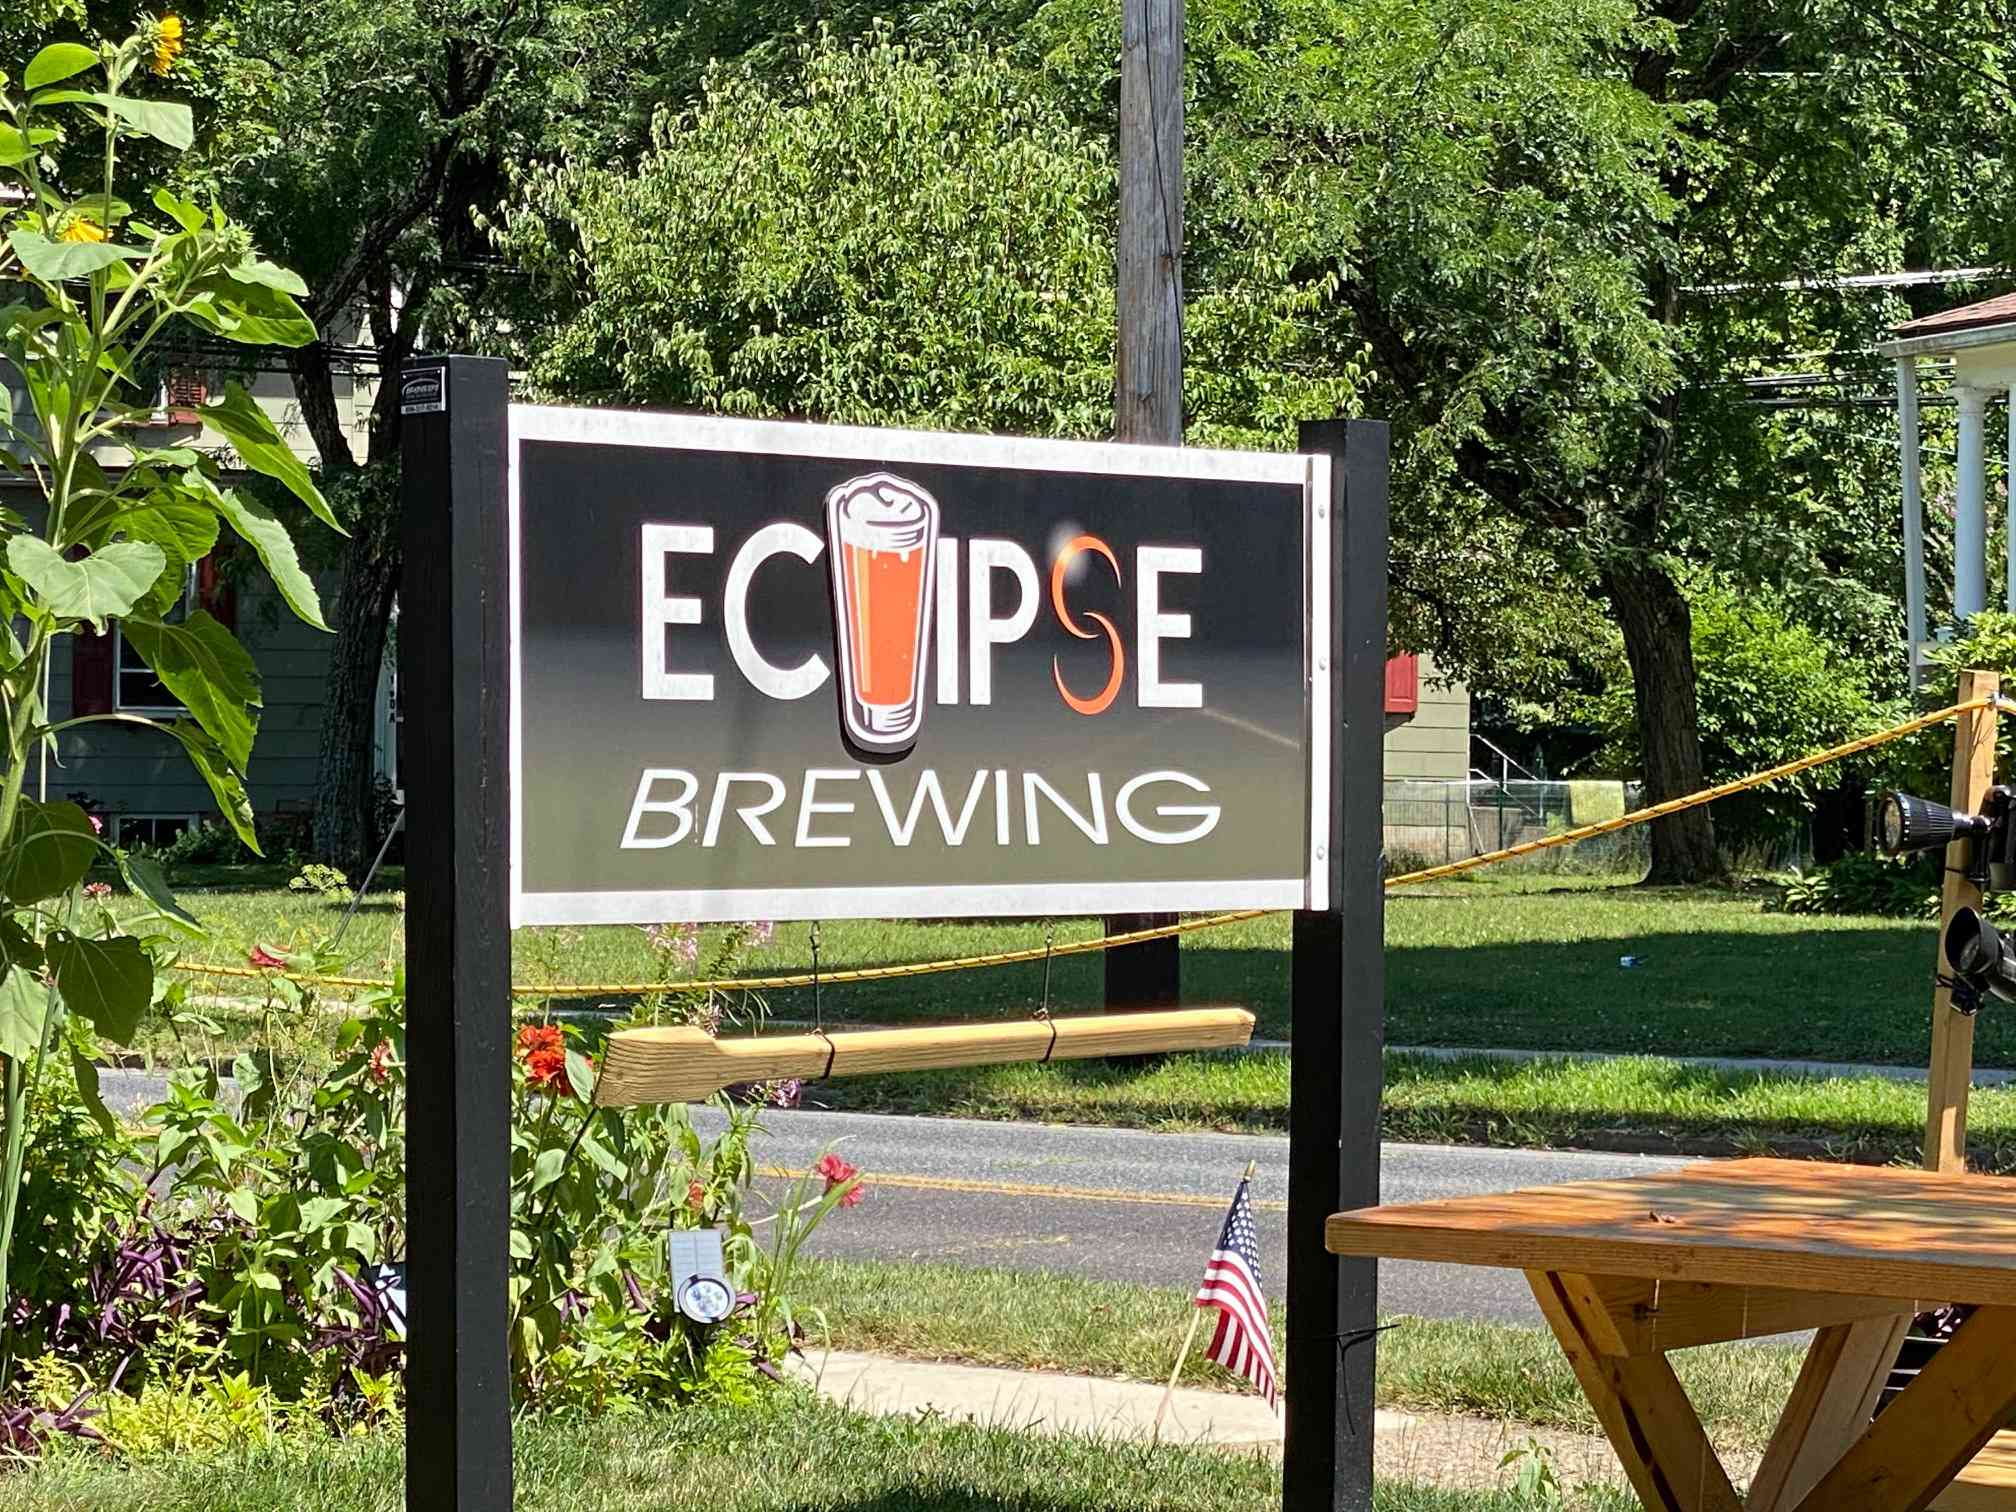 Eclipse brewing